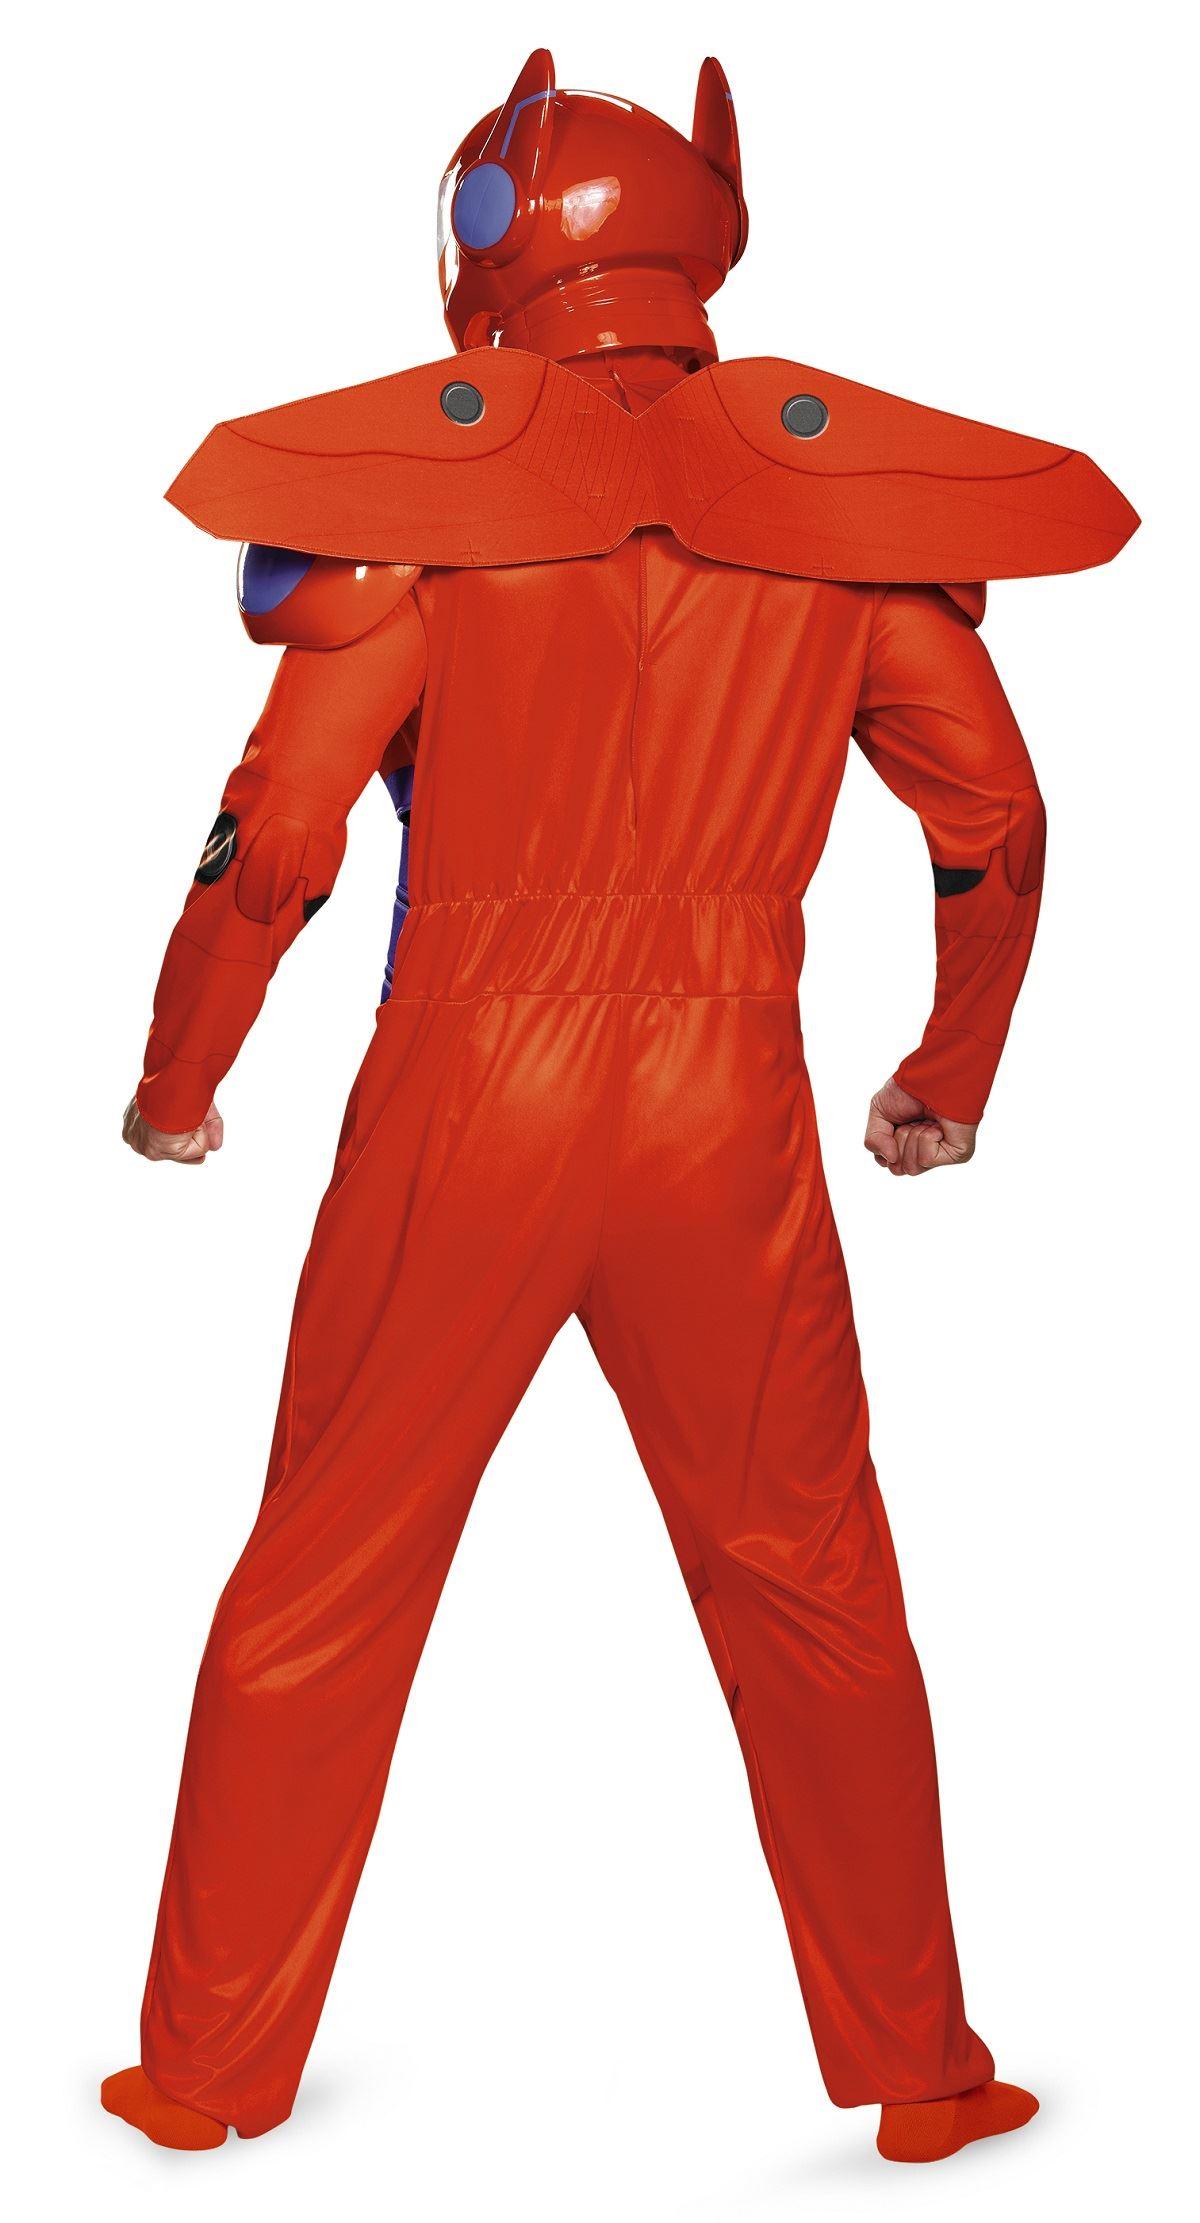 cbc6996adf0c ... Adult Red Baymax Big Hero 6 Men Deluxe Costume